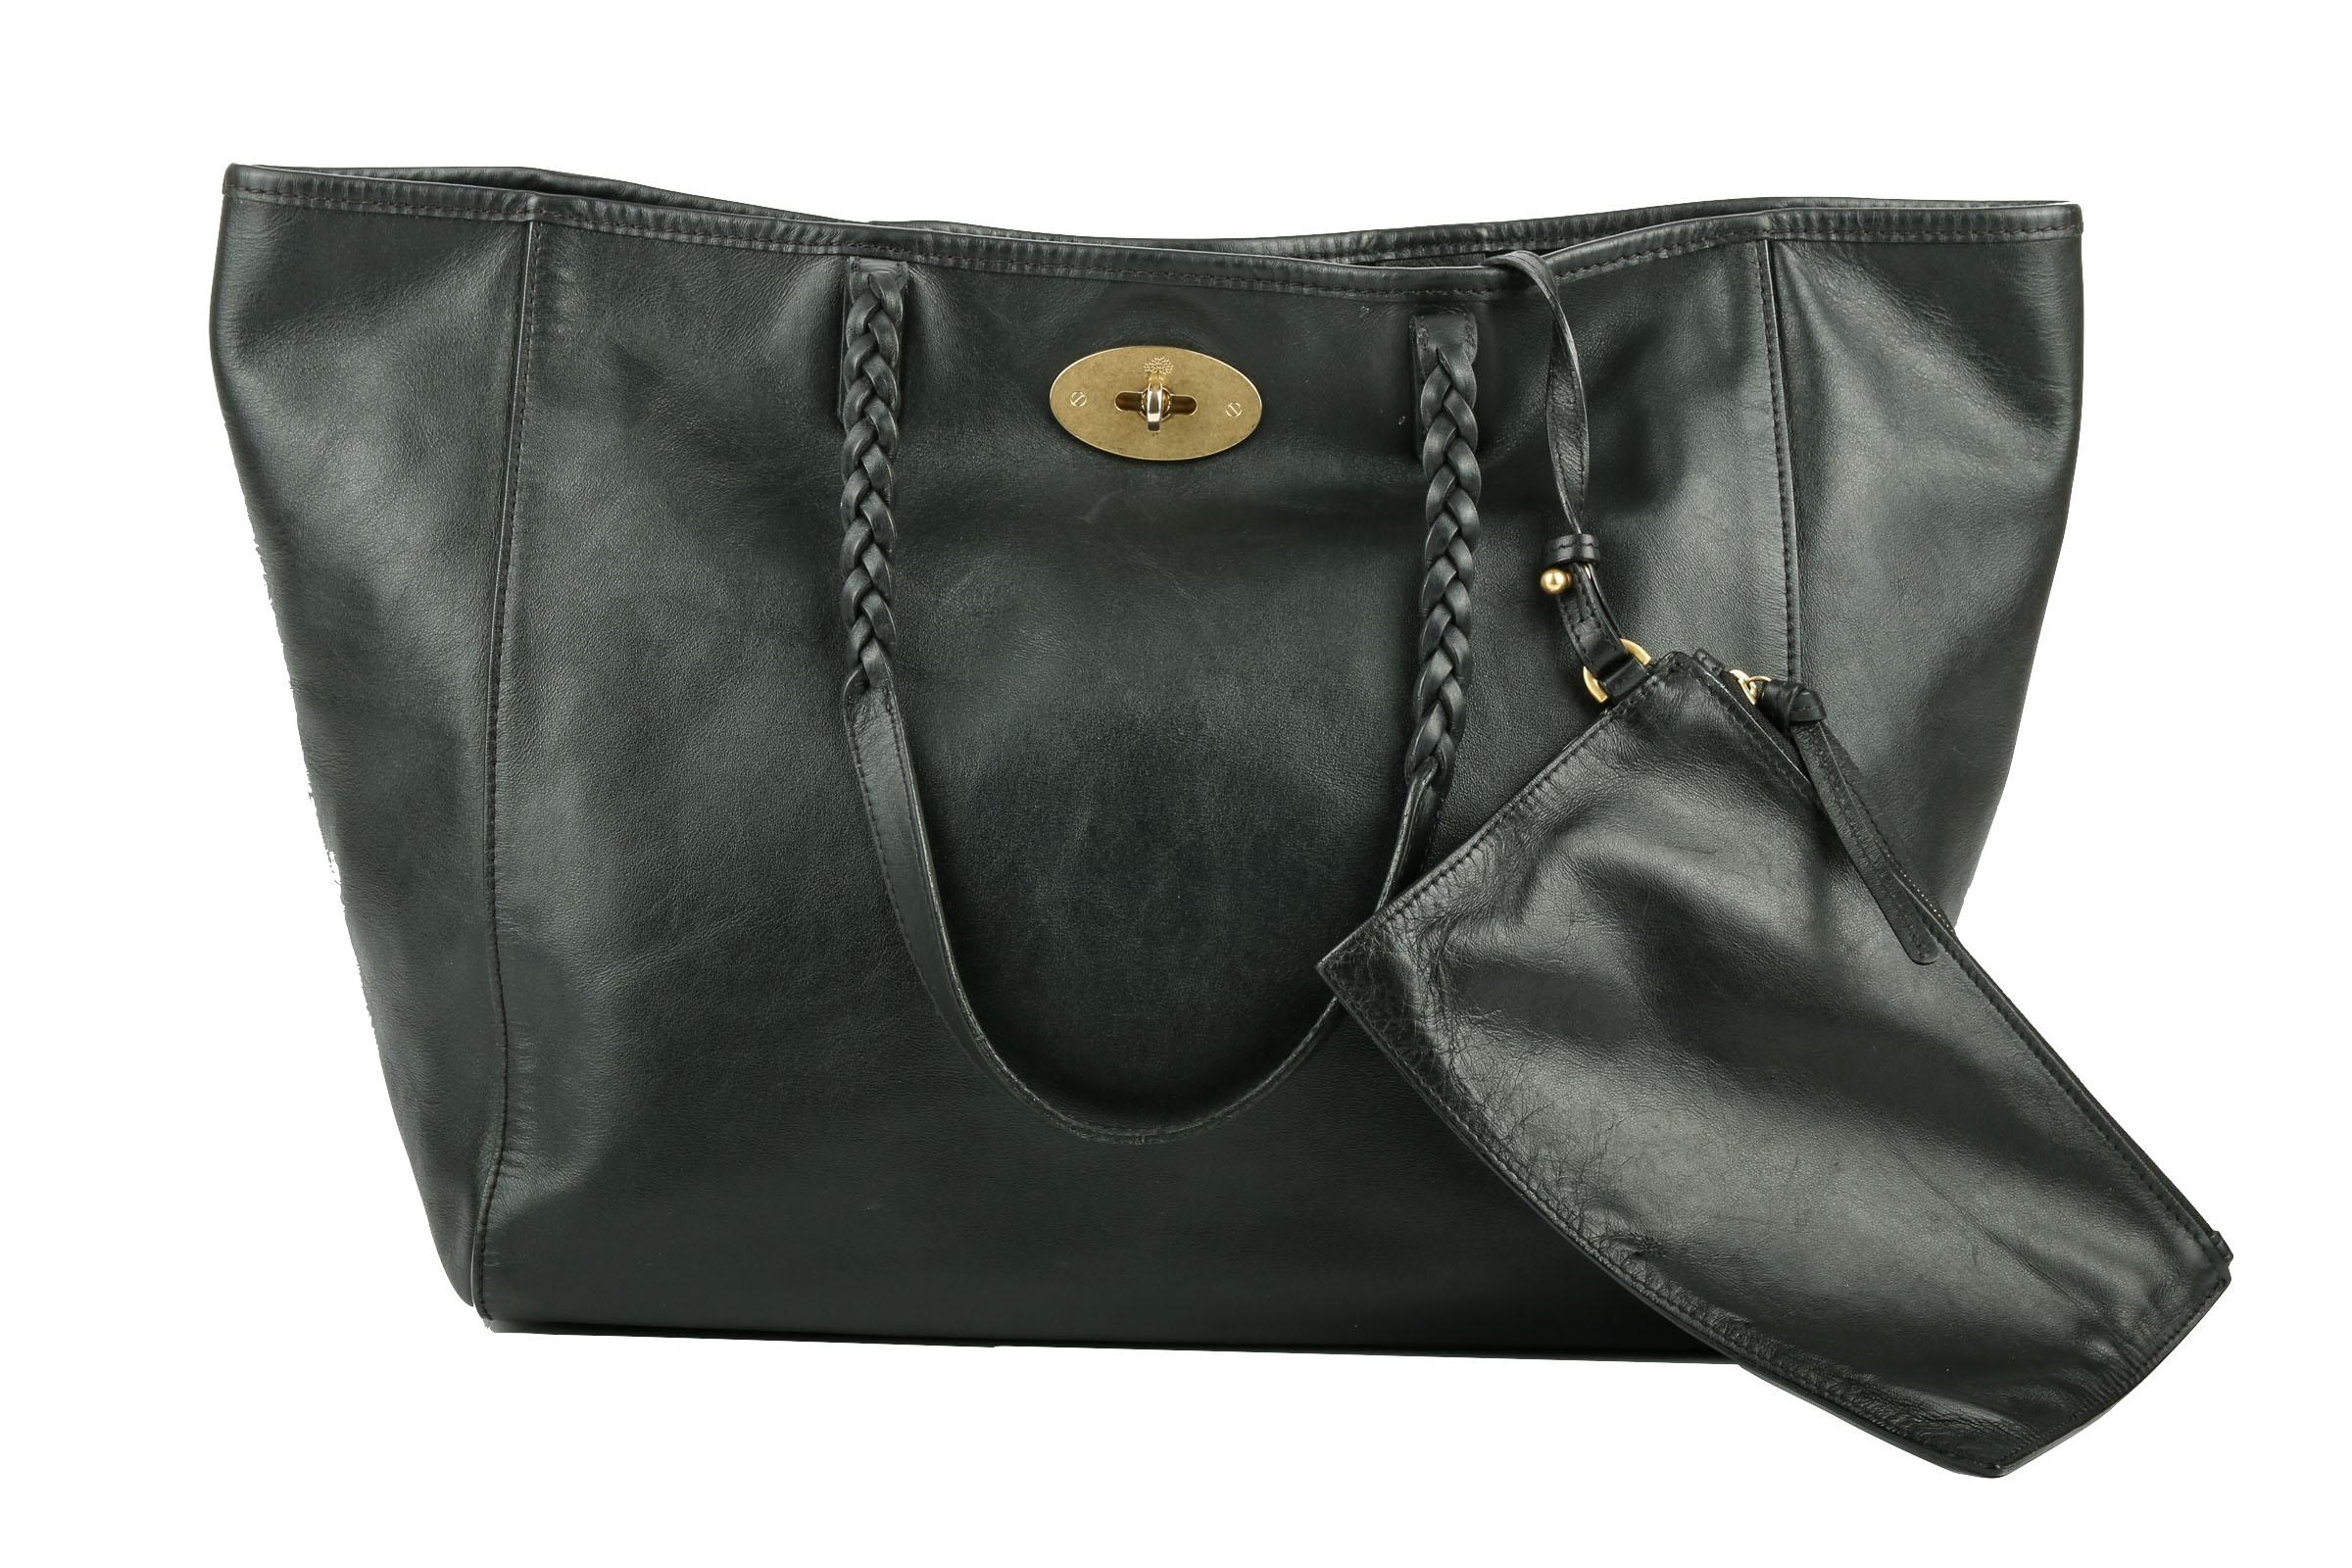 2b5cd293b6 Mulberry Handbags & Accessories | Luxussachen.com